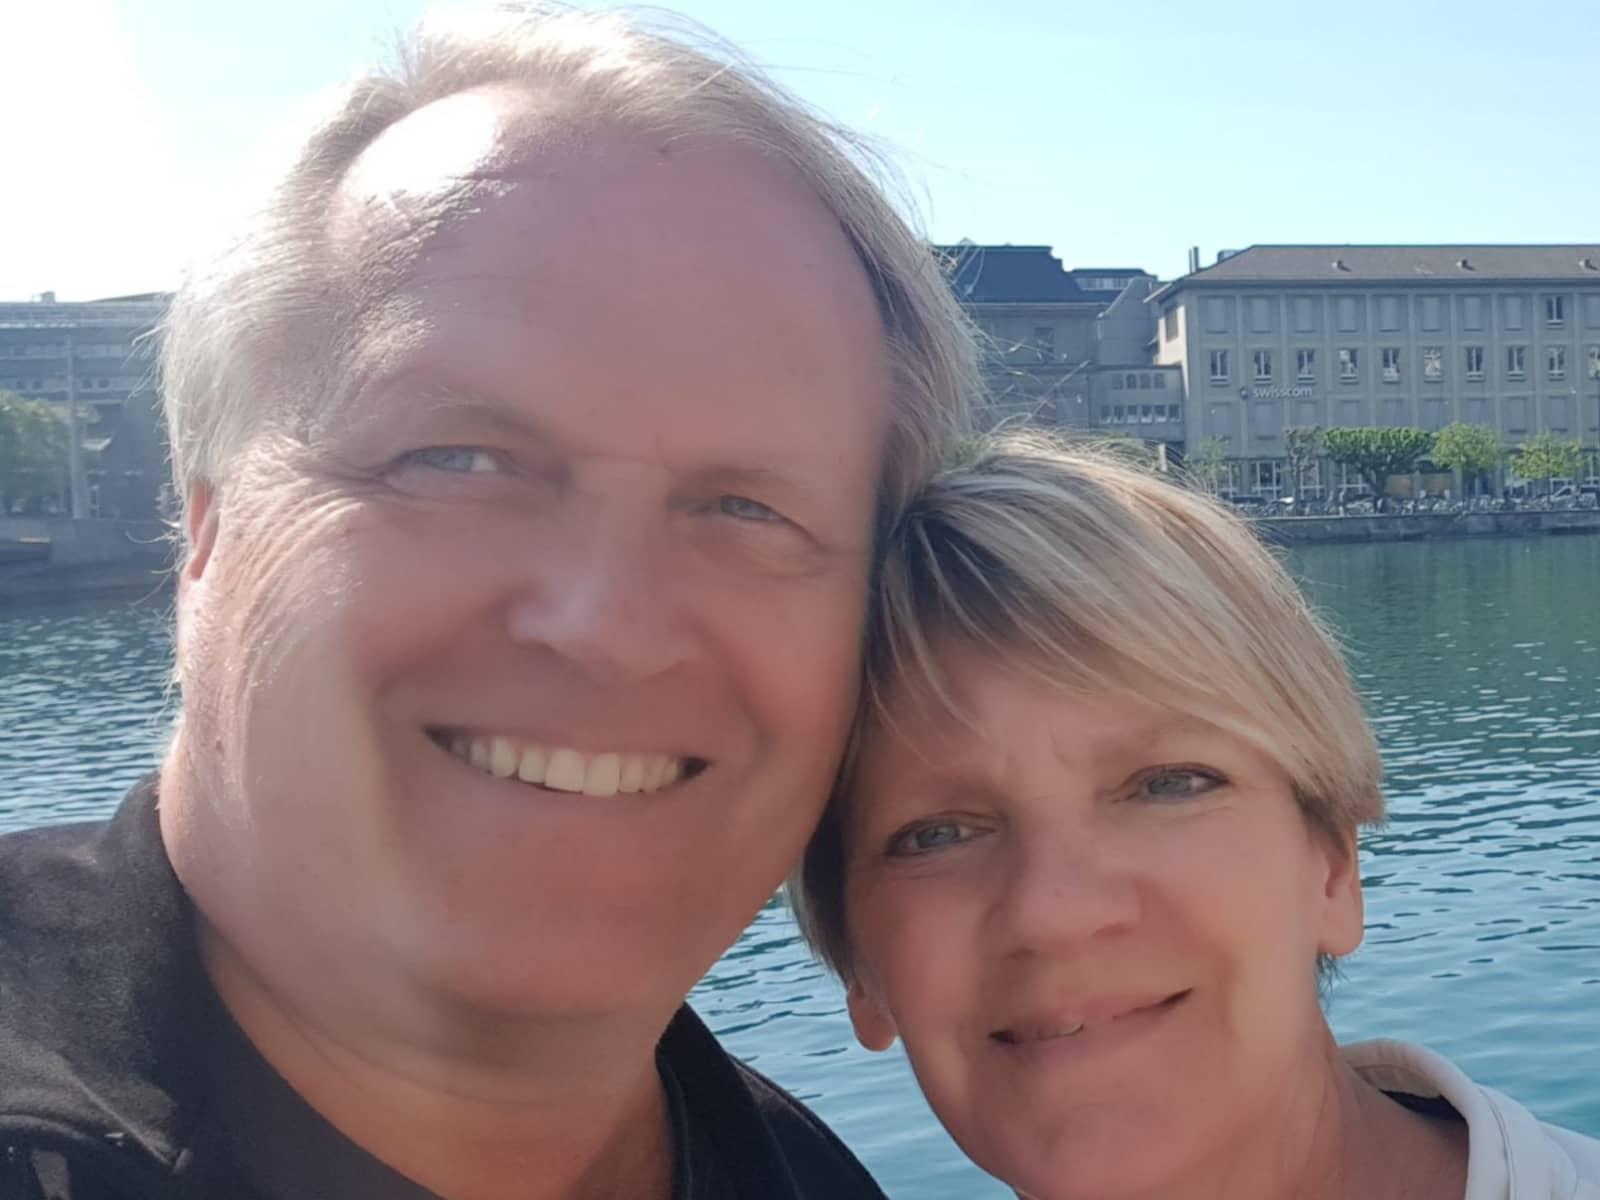 Birgit & Jorg from Vega de San Mateo, Spain